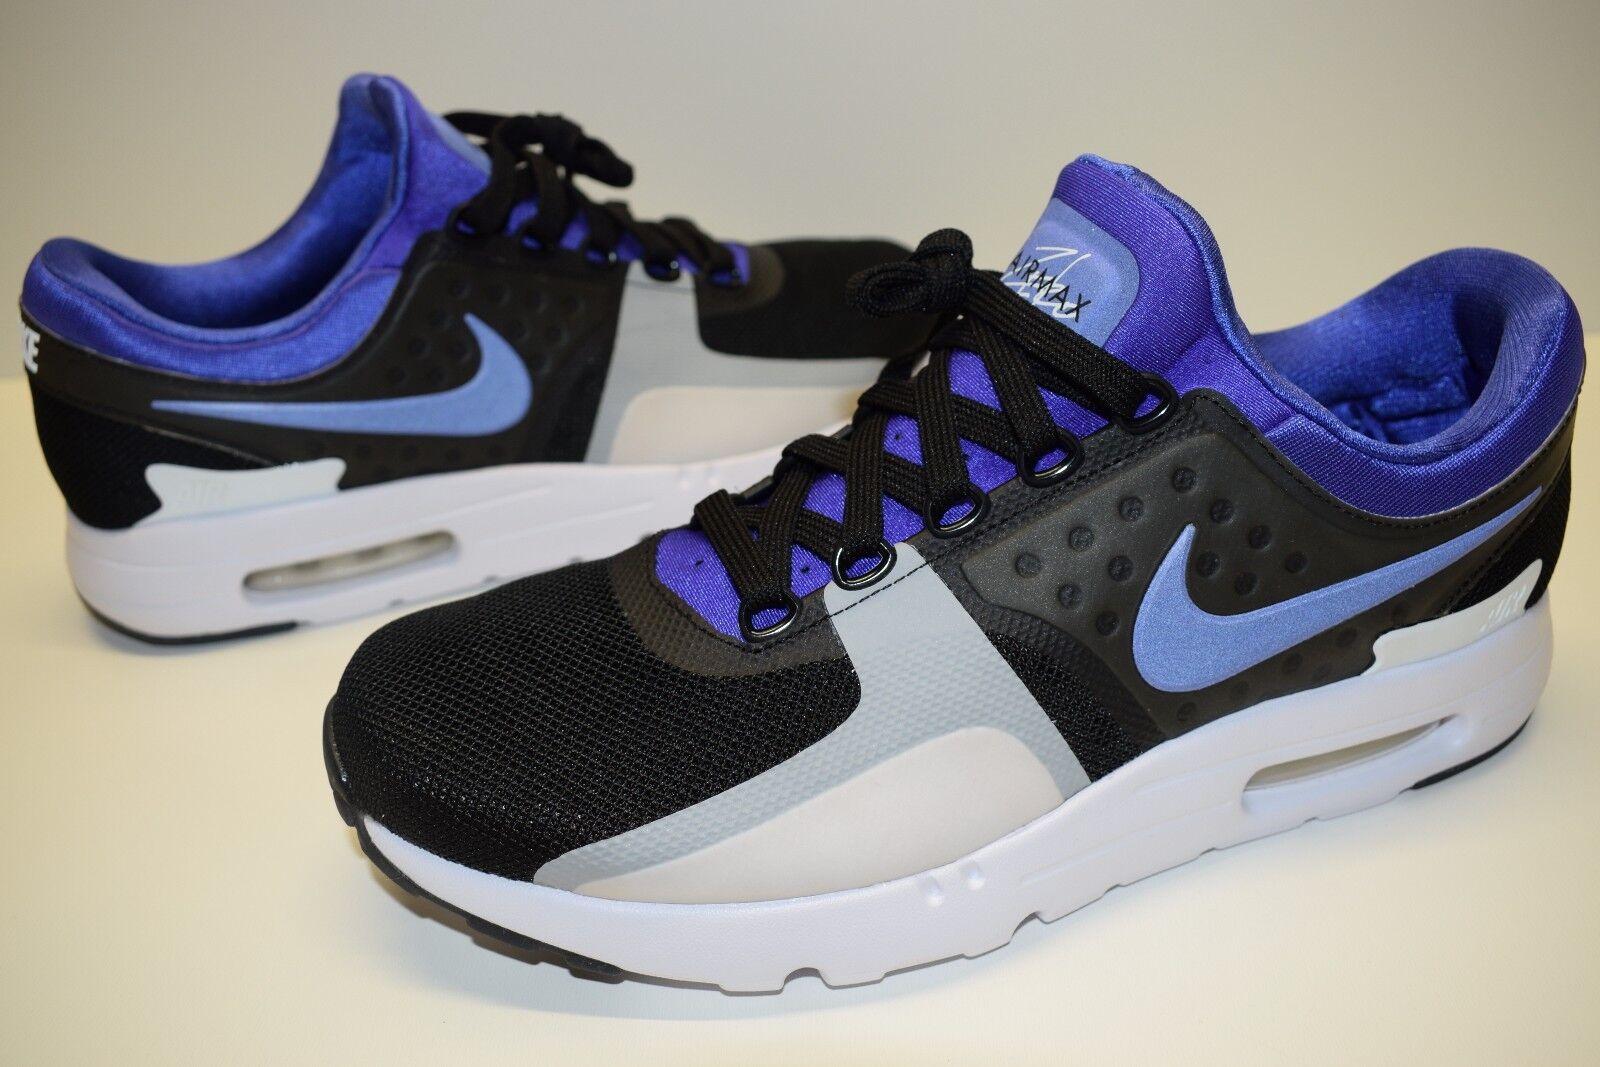 Nike Air Max Zero QS Men's Shoe Sneaker 789695 004 Sz US 9.5 NEW